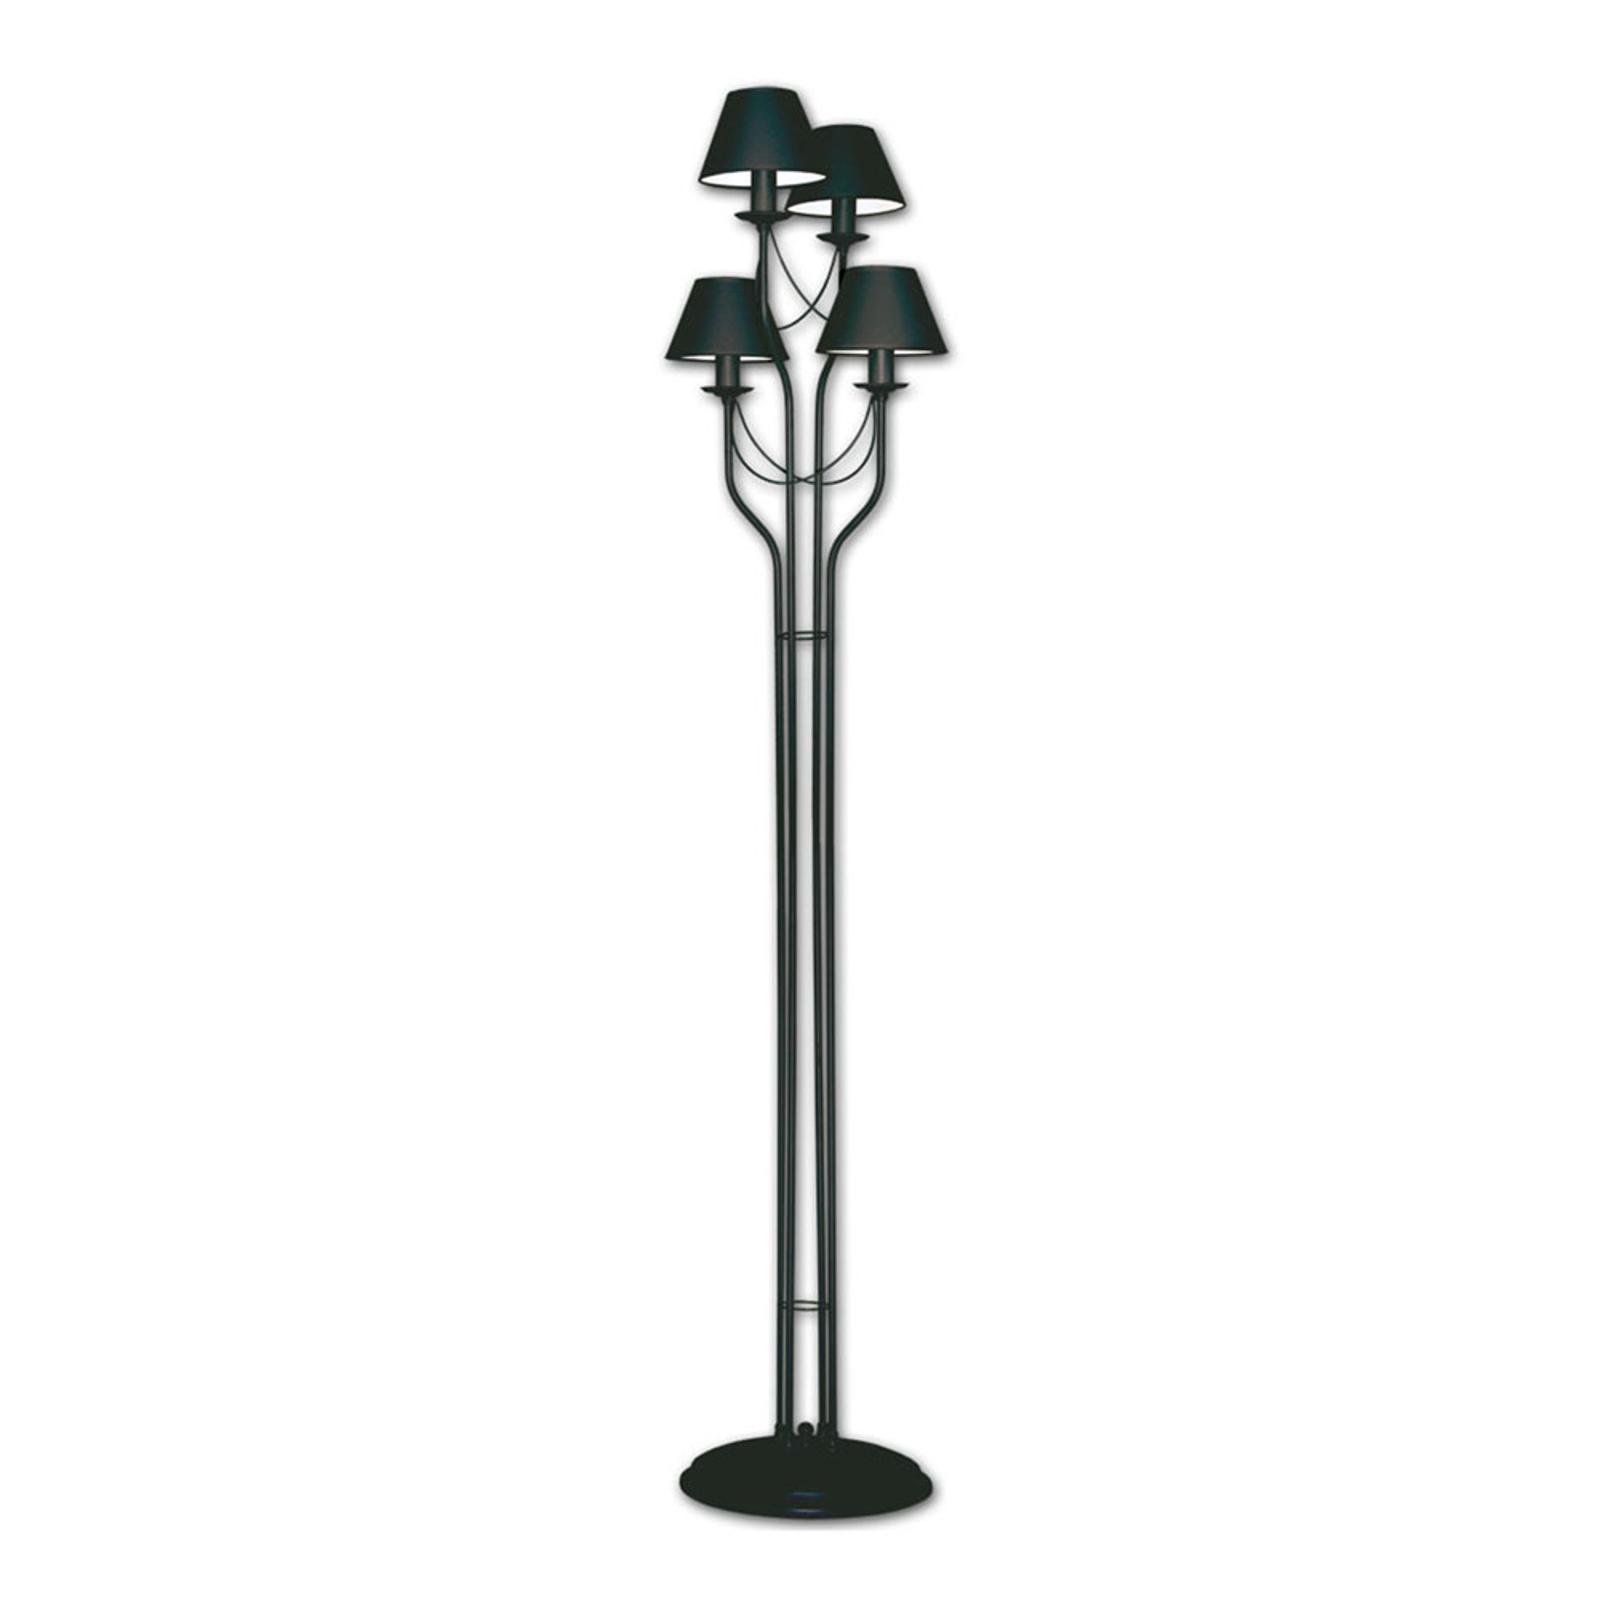 Czarna lampa stojąca Bona, cztery tekstylne klosze